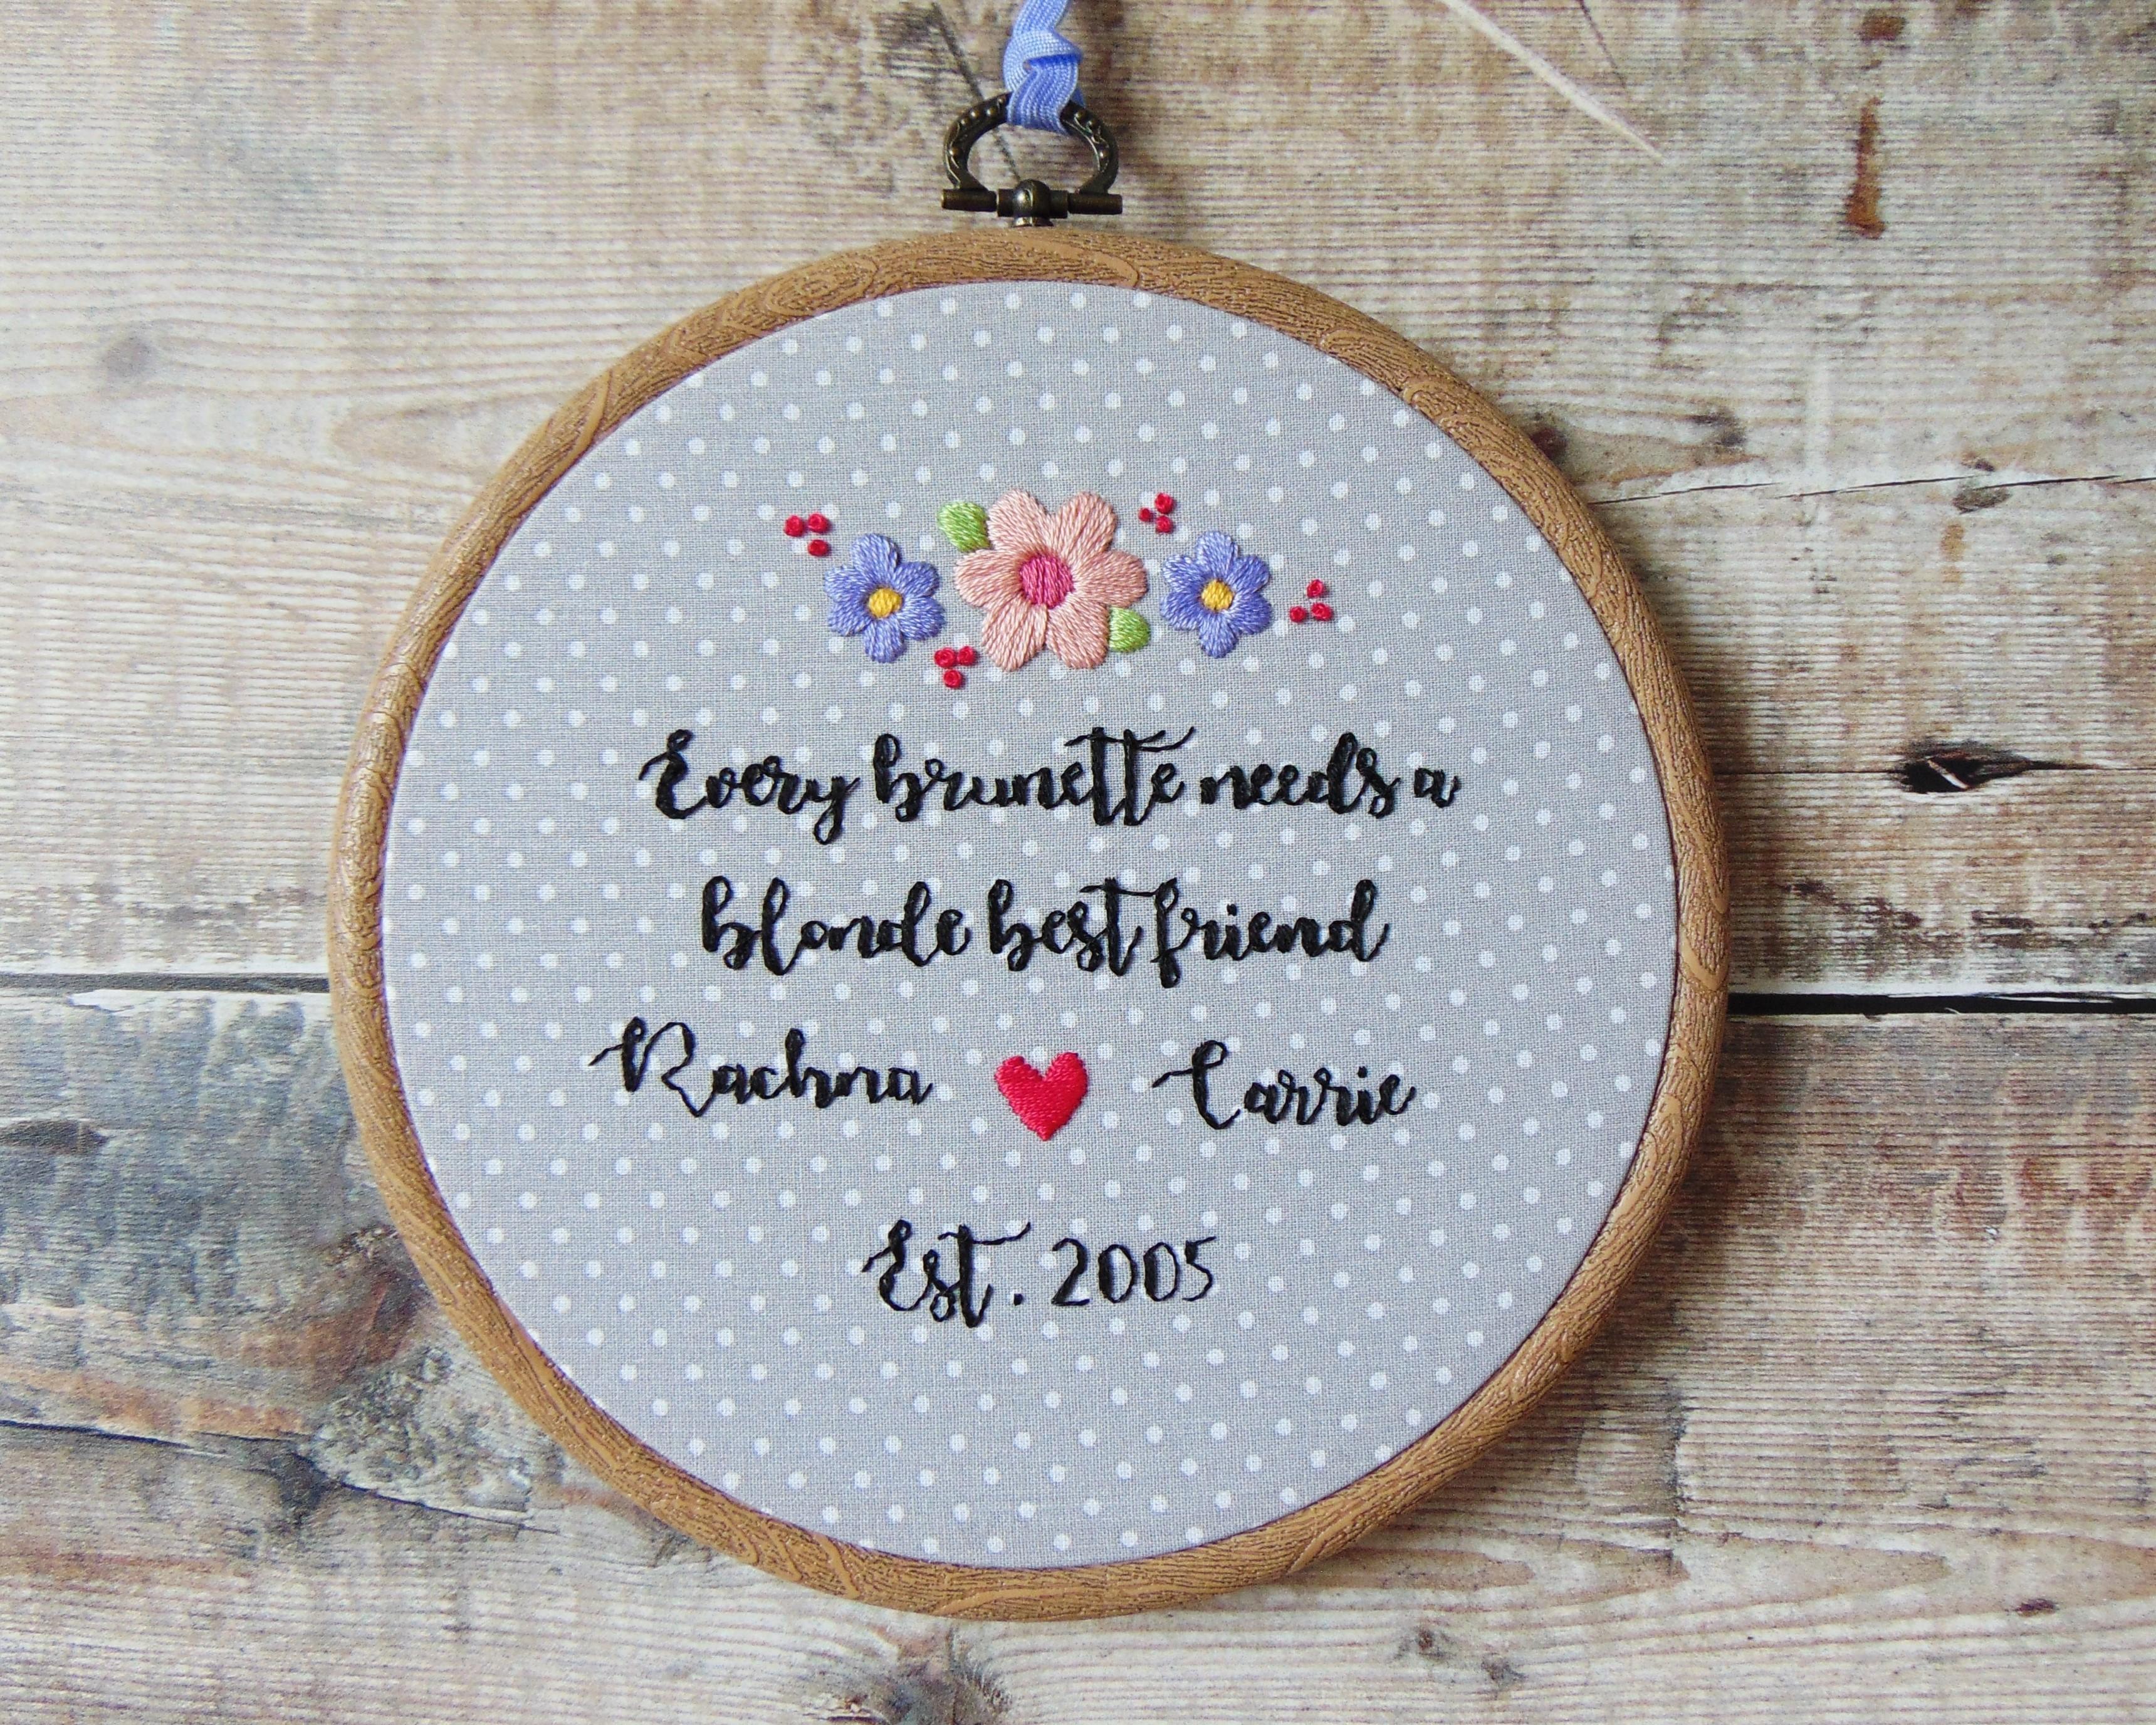 Floral Dotty Friendship Quote 1 - Copy